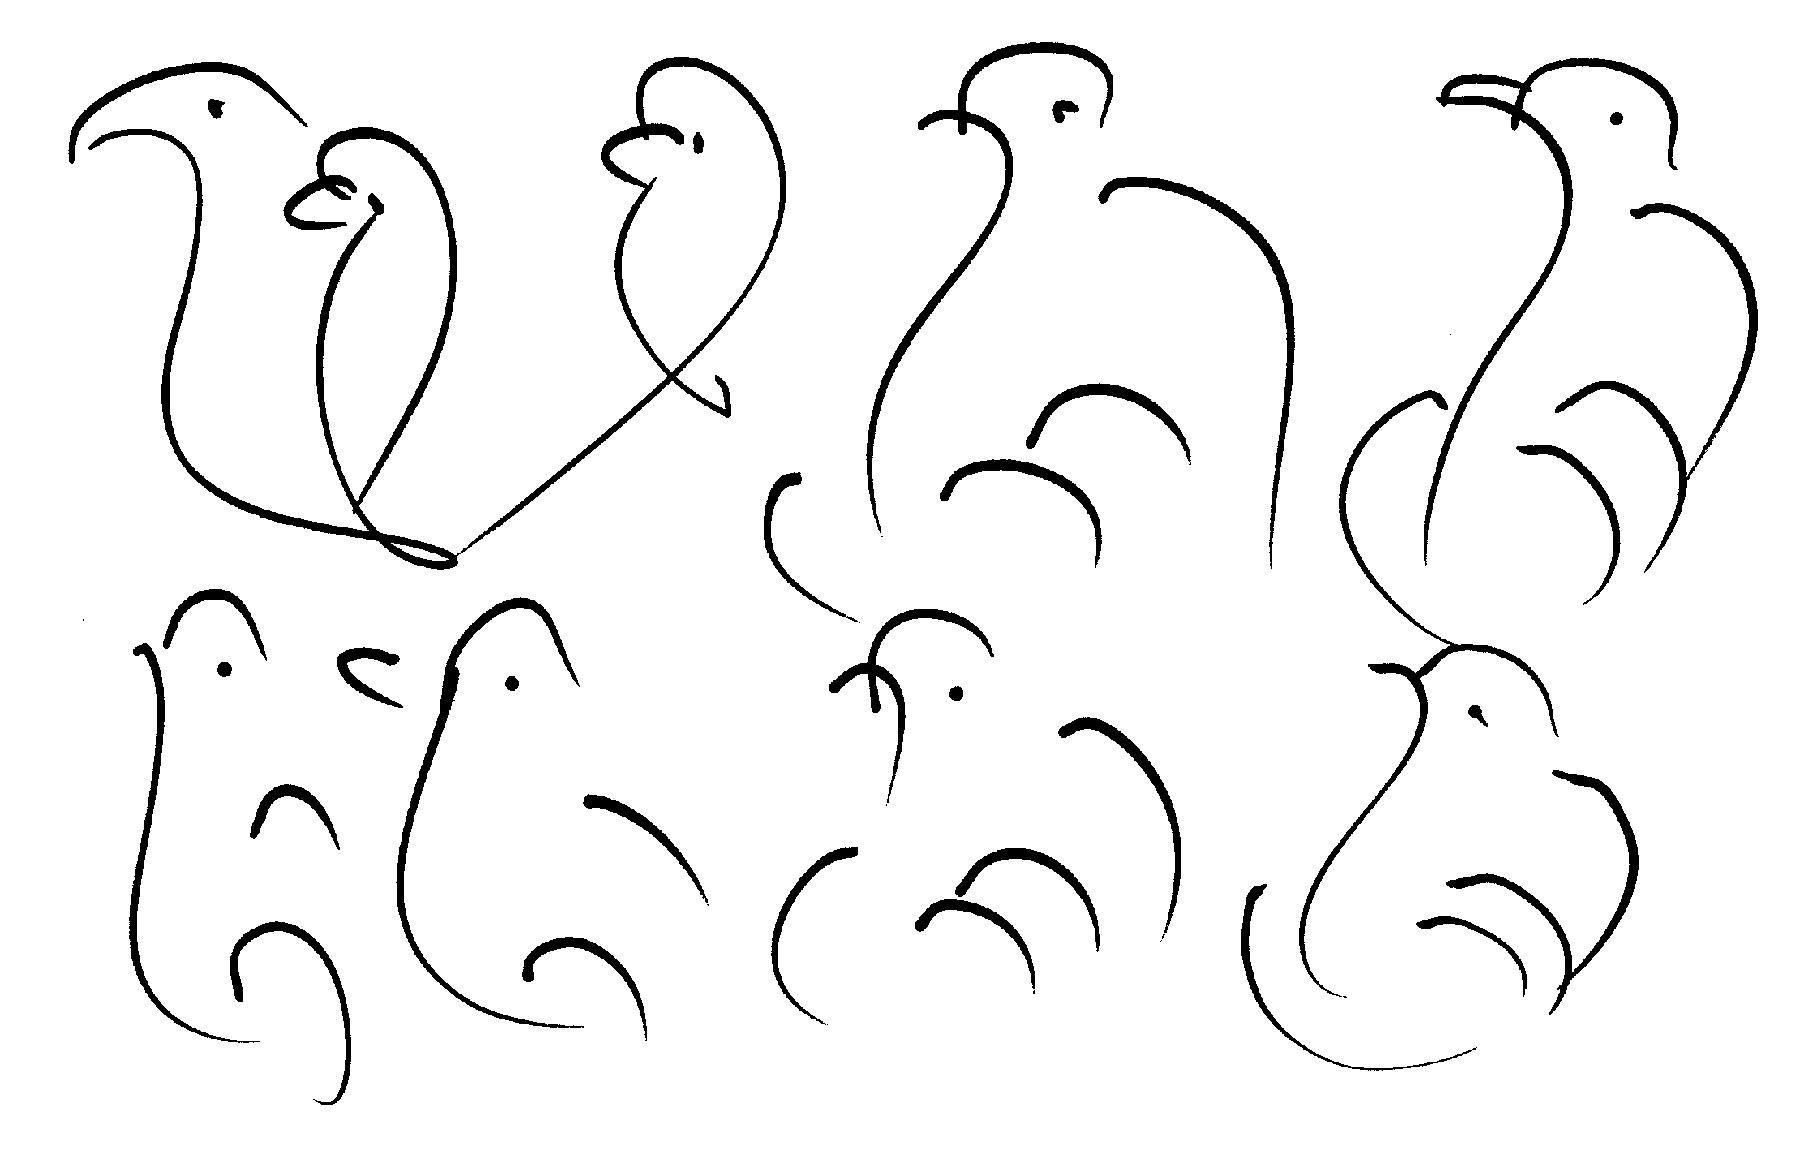 176-birds-ckg